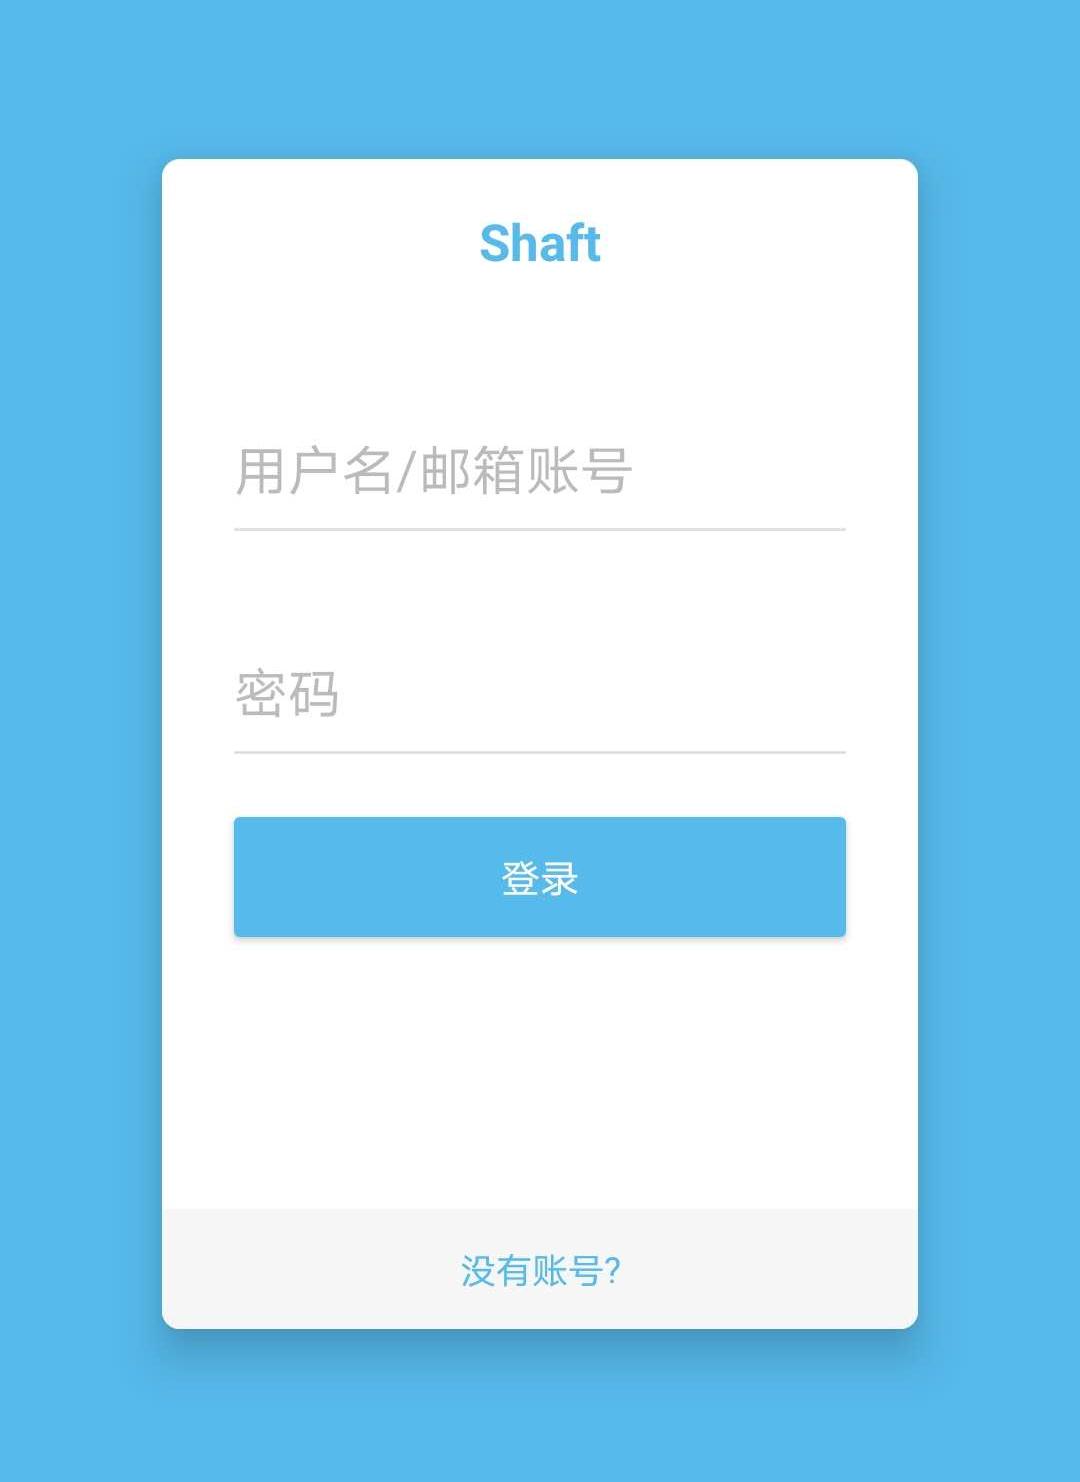 5fa9f6f01cd1bbb86ba33f74 日本艺术家所组成的虚拟社群--Pixiv